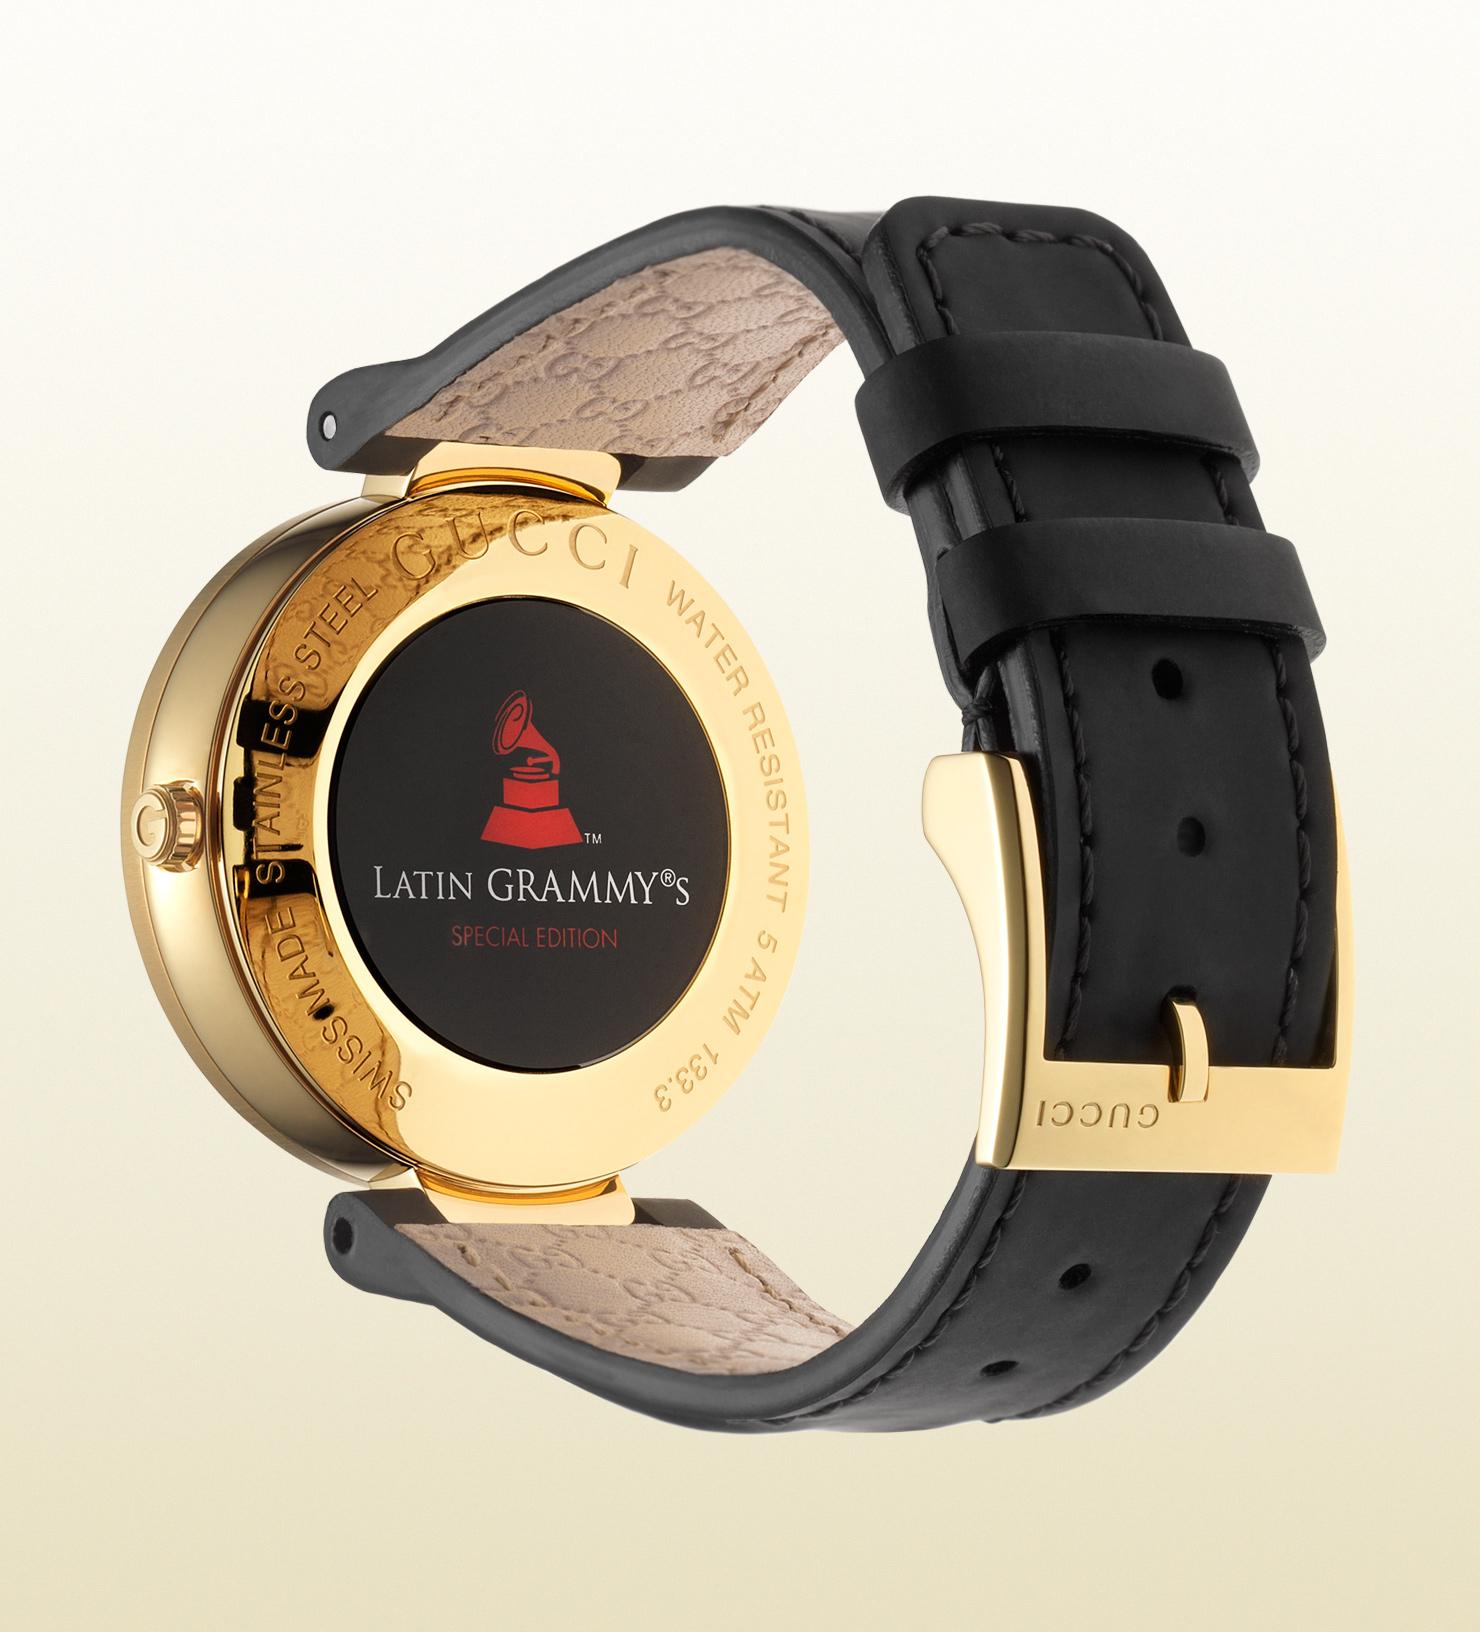 db204b4e044 Lyst - Gucci Latin Grammy® Special Edition Interlocking Watch in Metallic  for Men